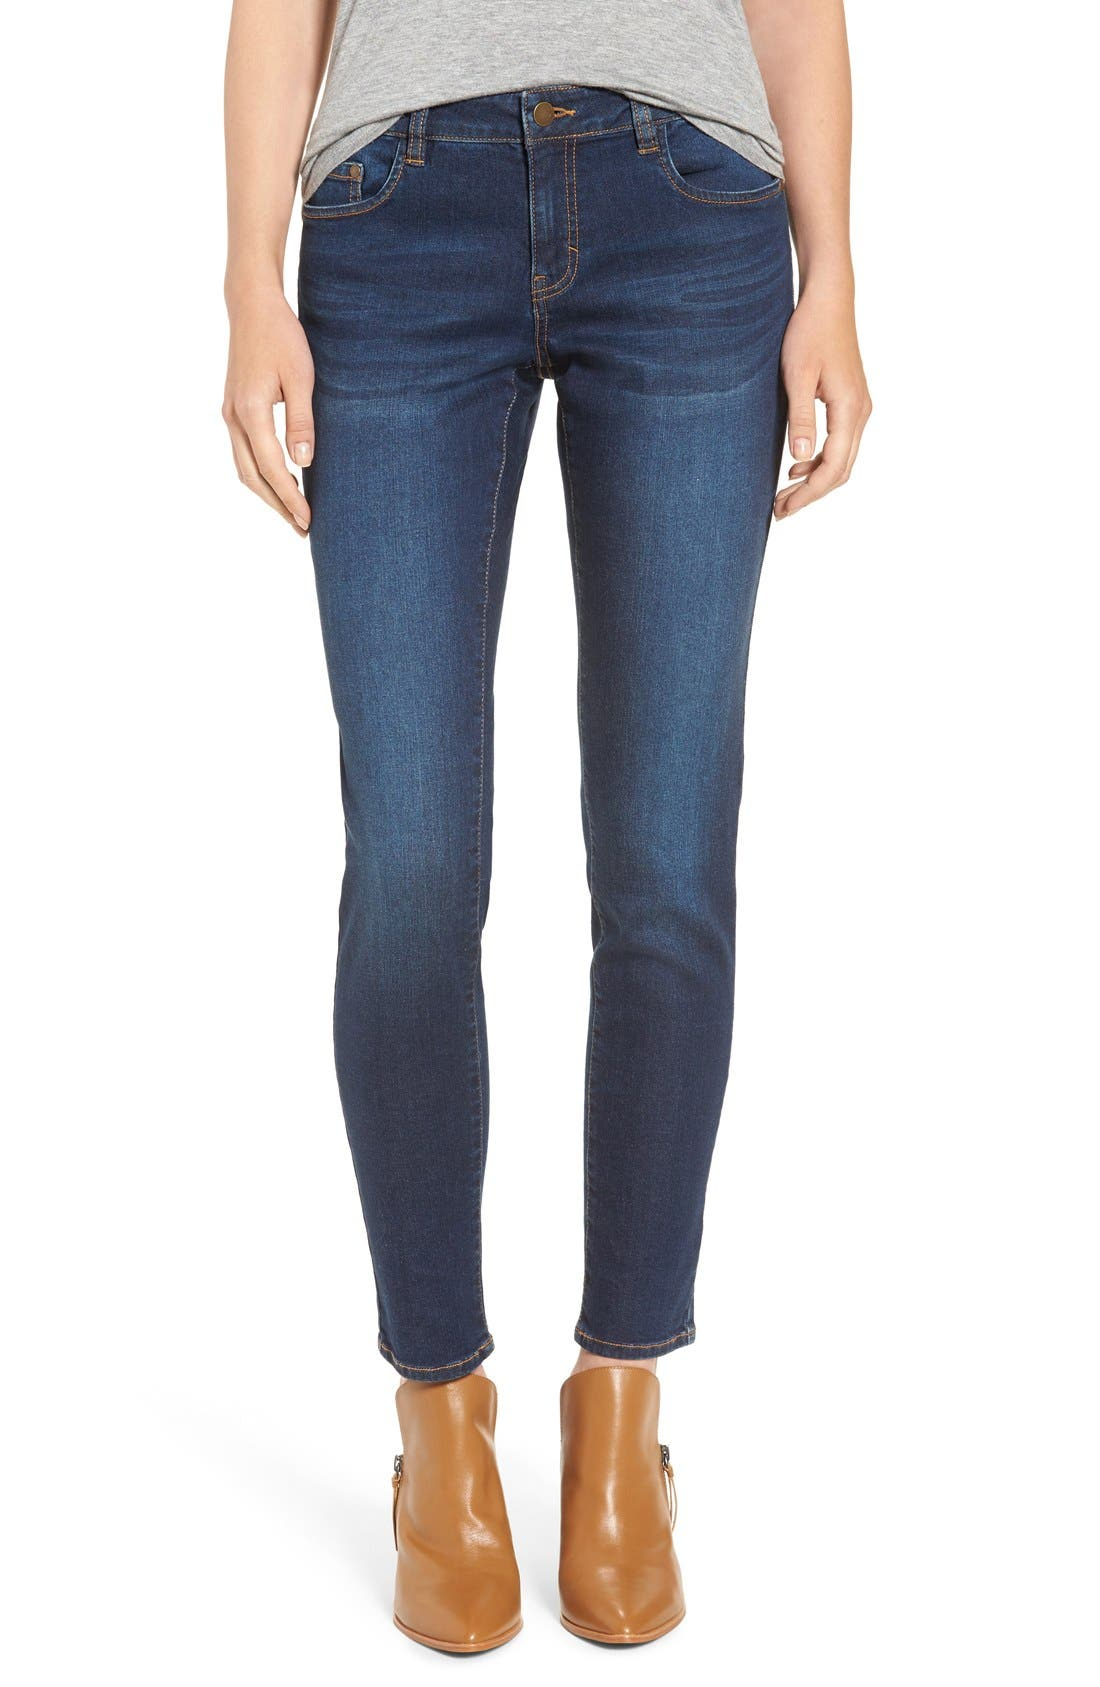 Alternate Image 1 Selected - BP. Mid Rise Skinny Jeans